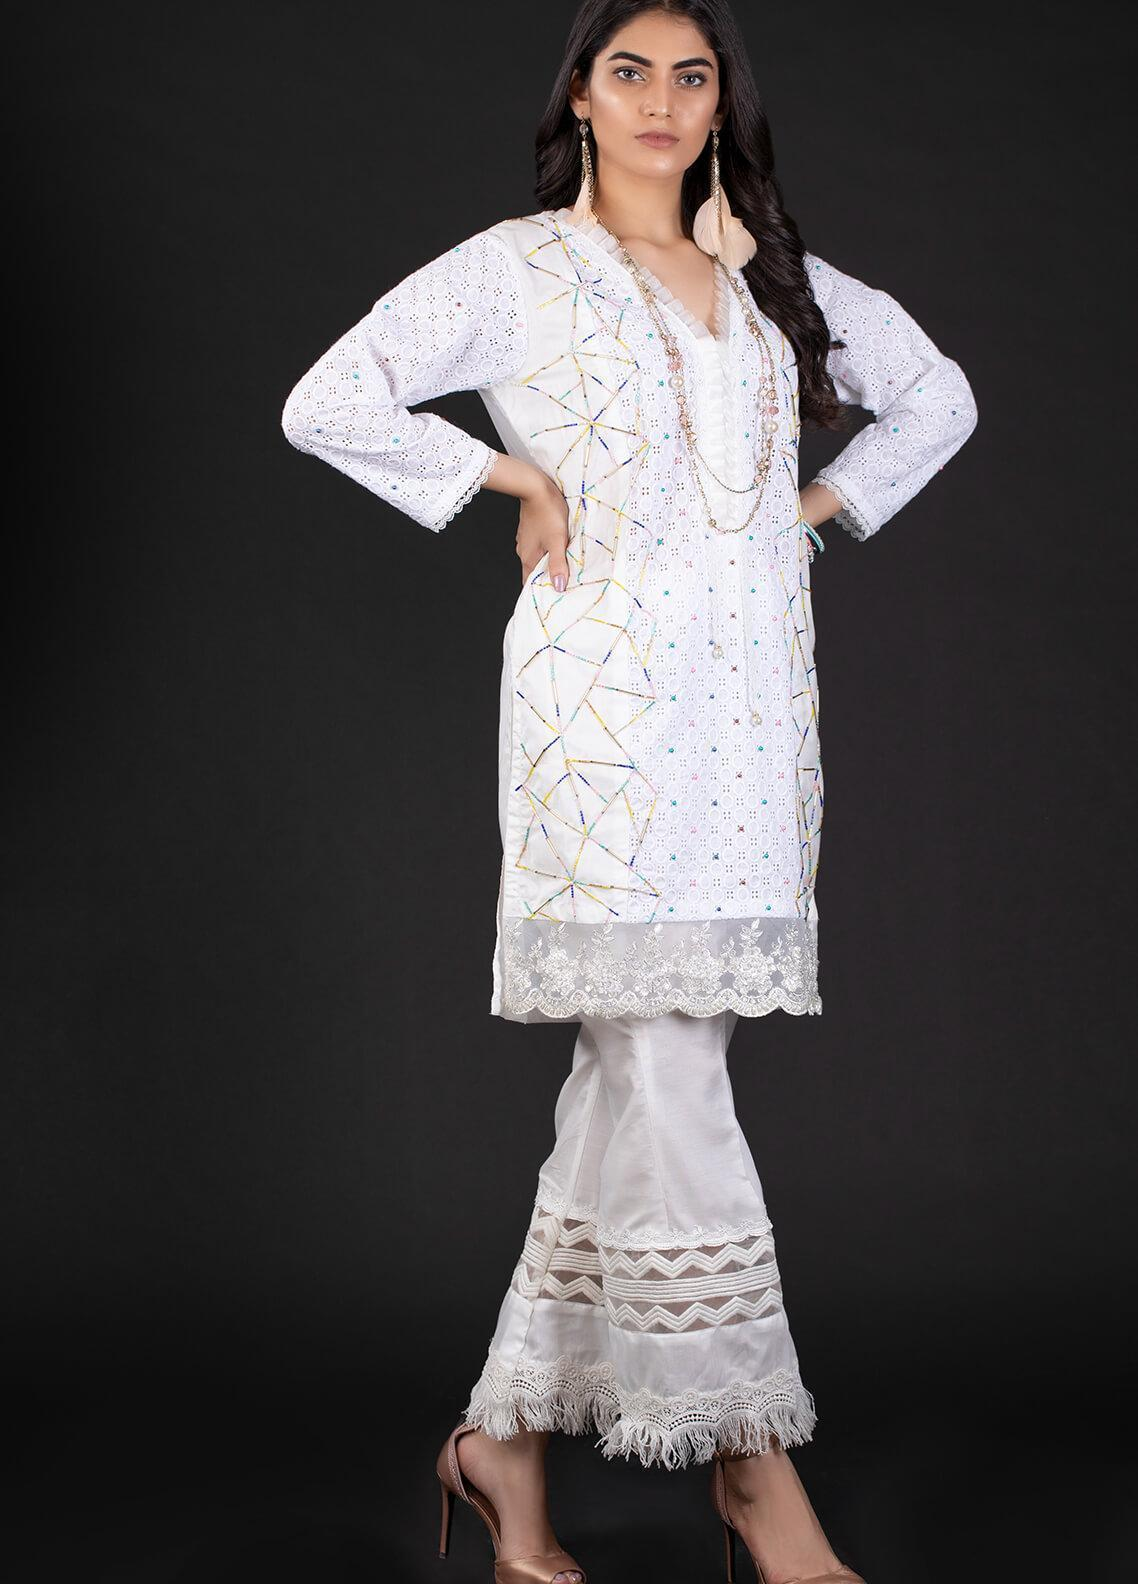 Sidra Mumtaz Embroidered Schiffli Stitched 2 Piece Suit 1A ASTRATTO